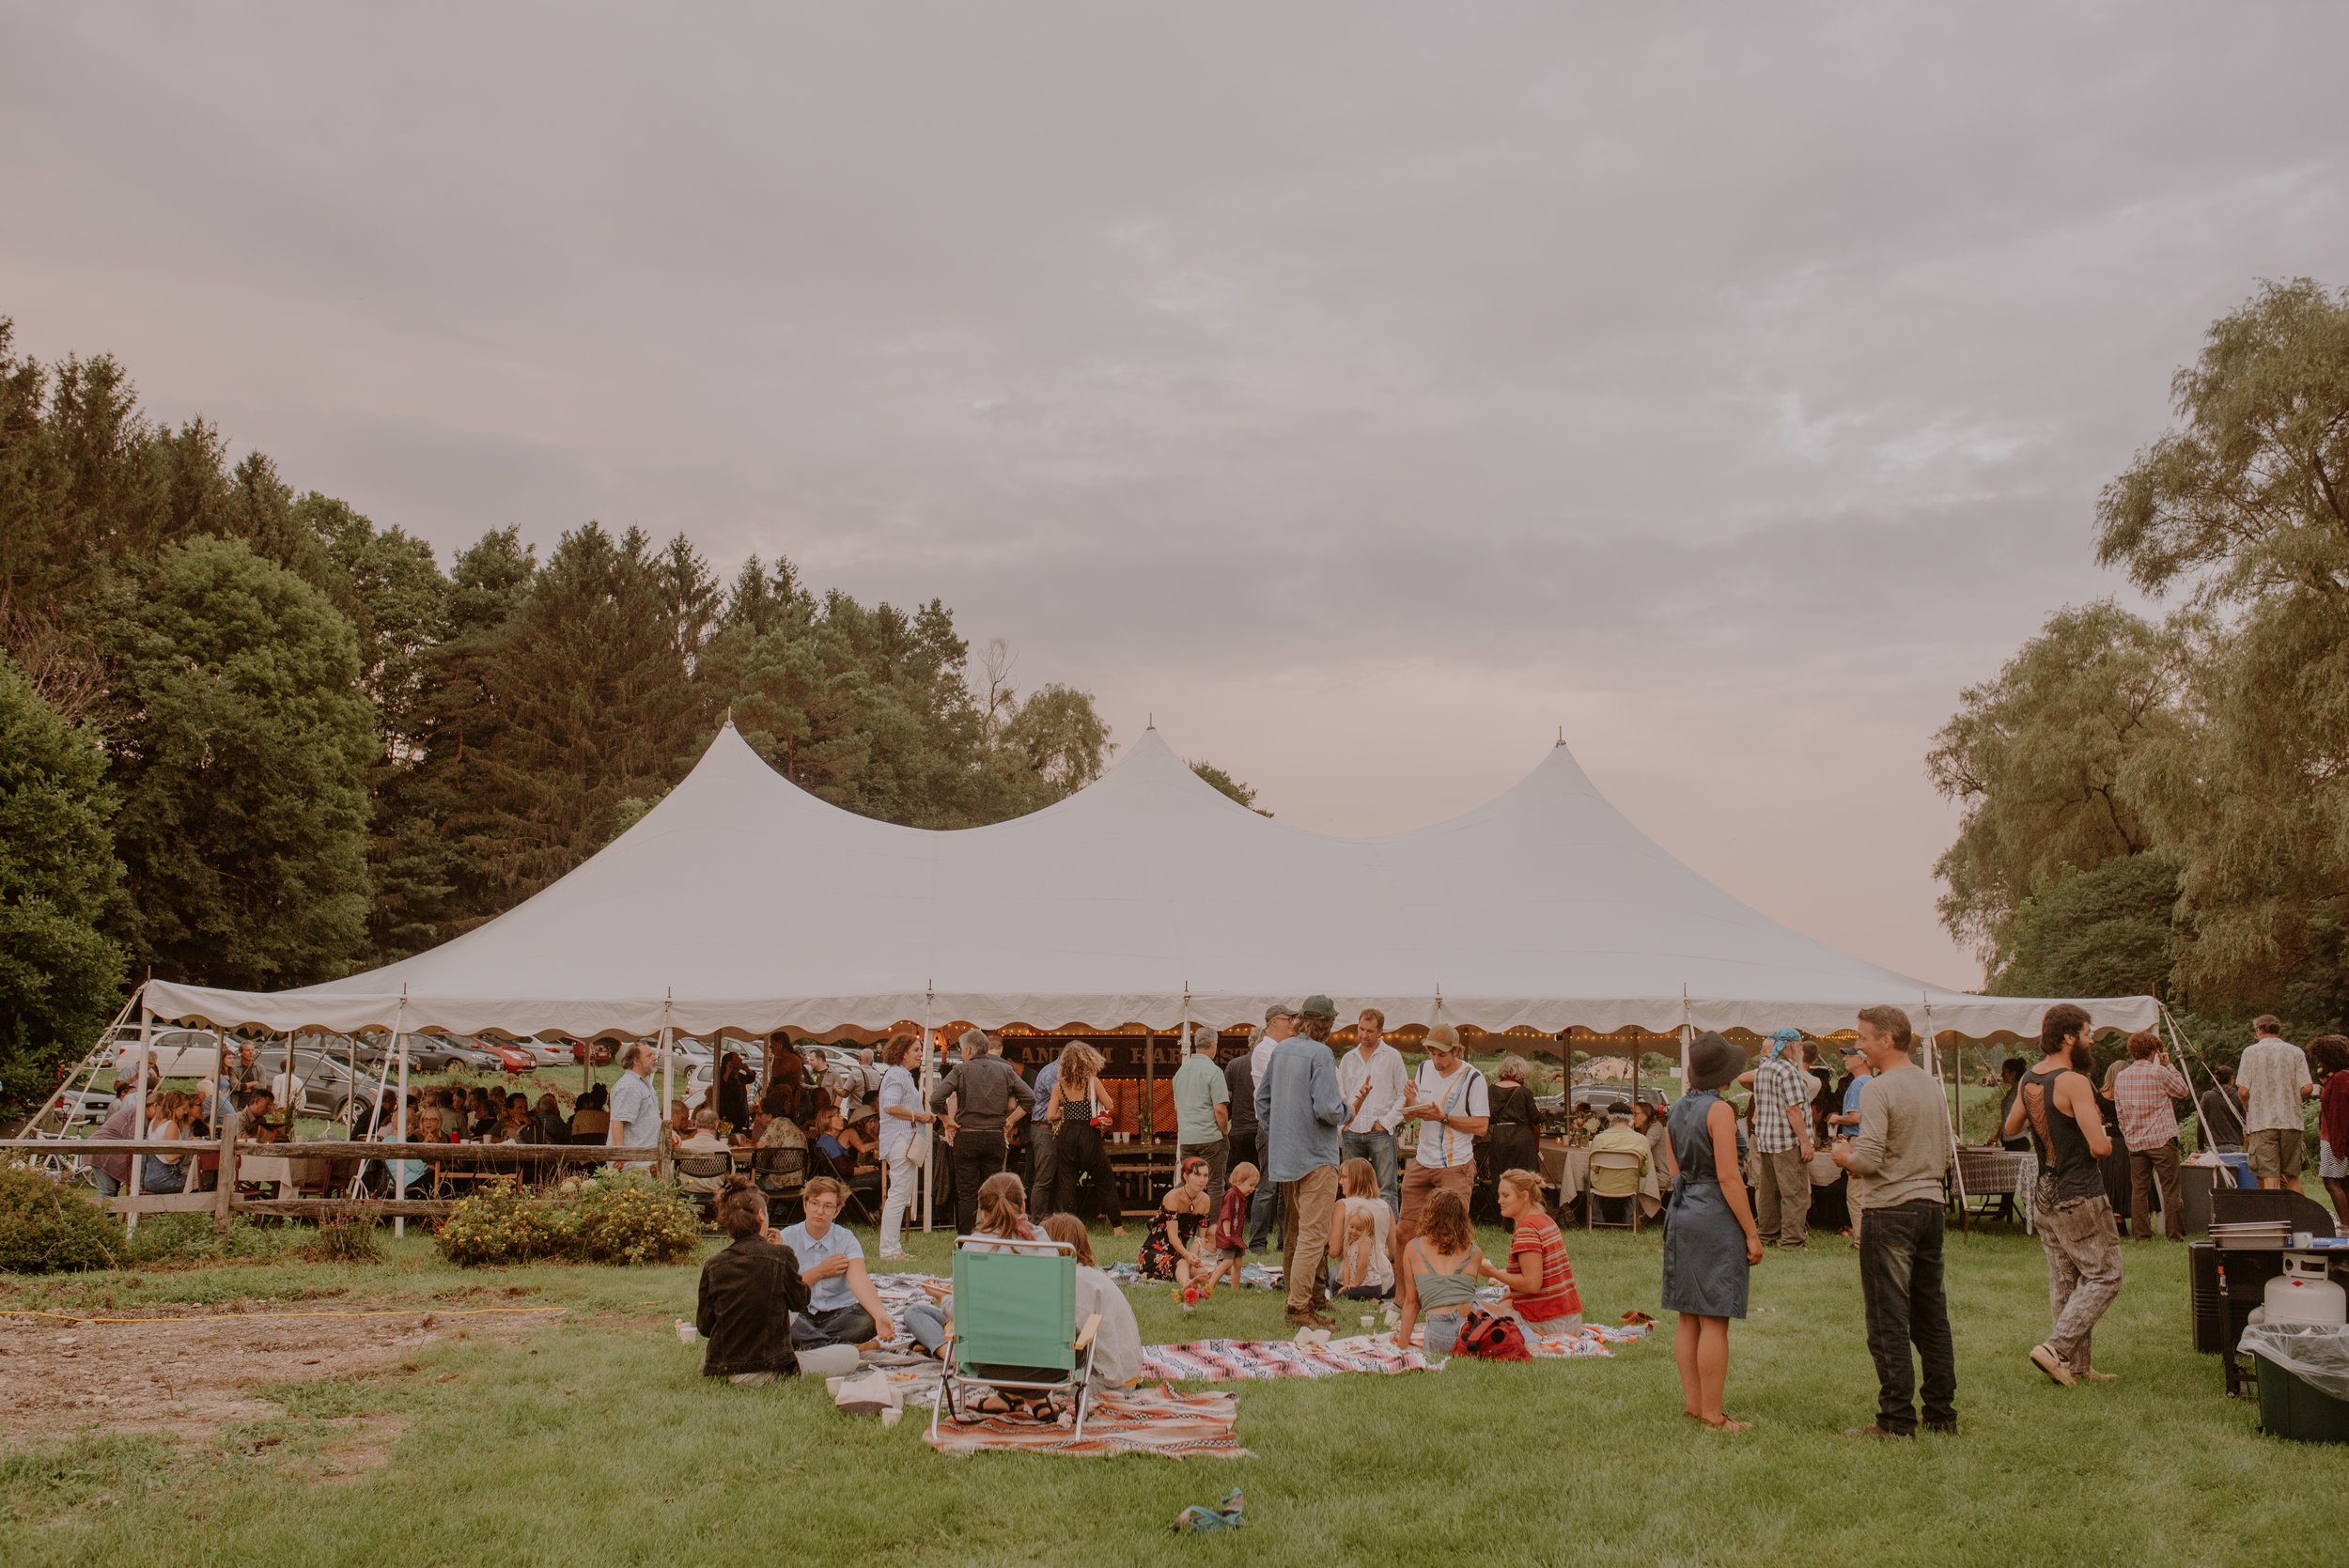 Random-Harvest-August-2018-Pre-Launch-Event-Craryville-NY-Lawrence-Braun-0012.jpg